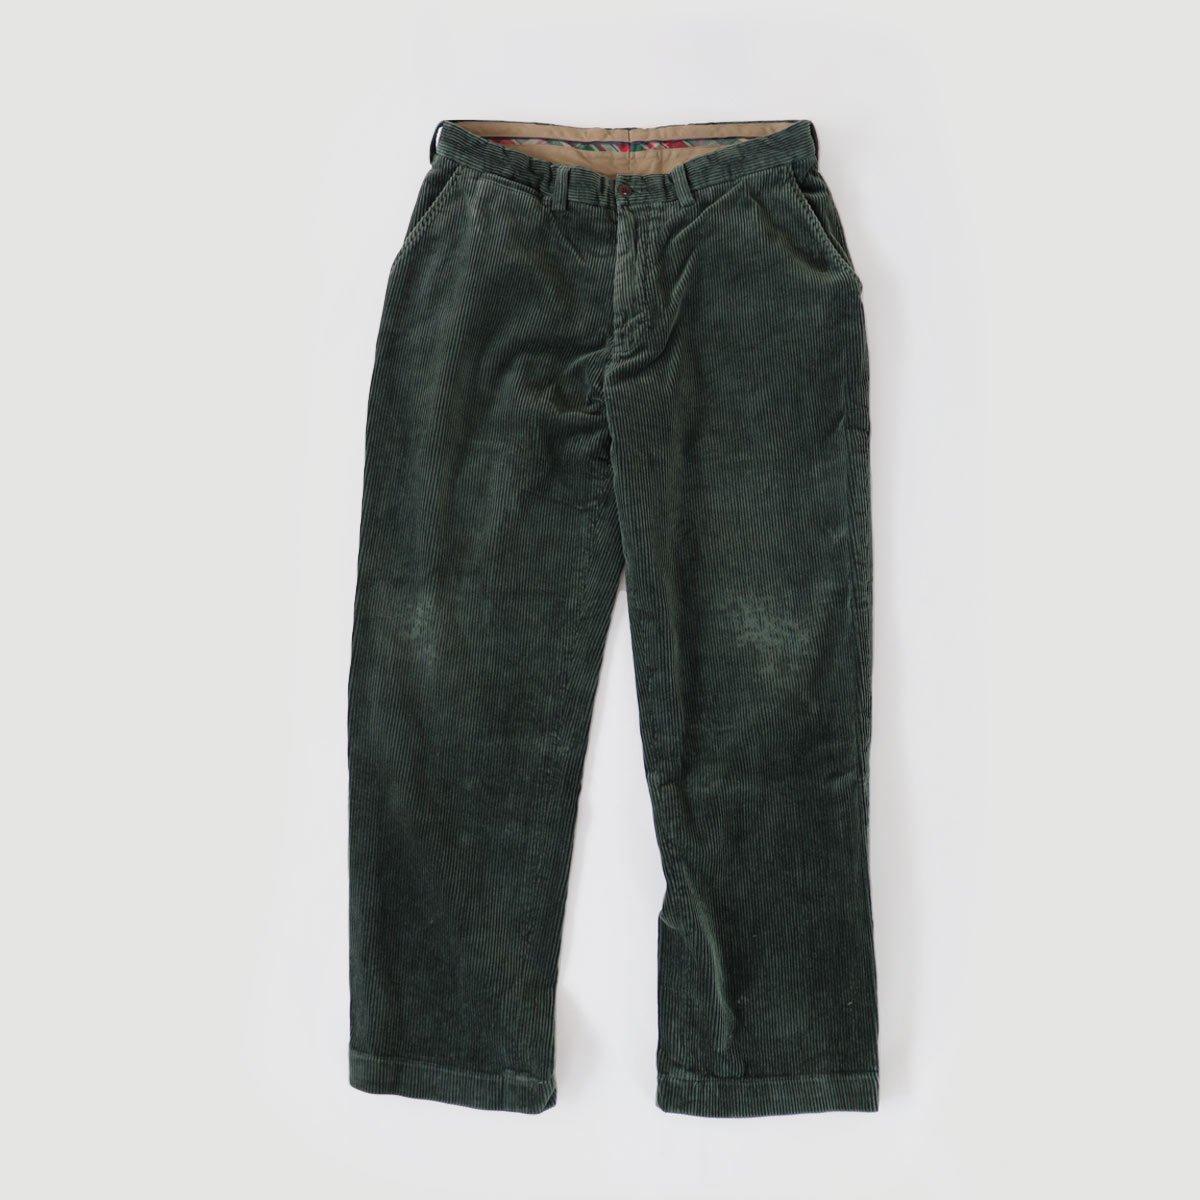 POLO RALPH LAUREN CORDUROY PANTS 詳細画像1